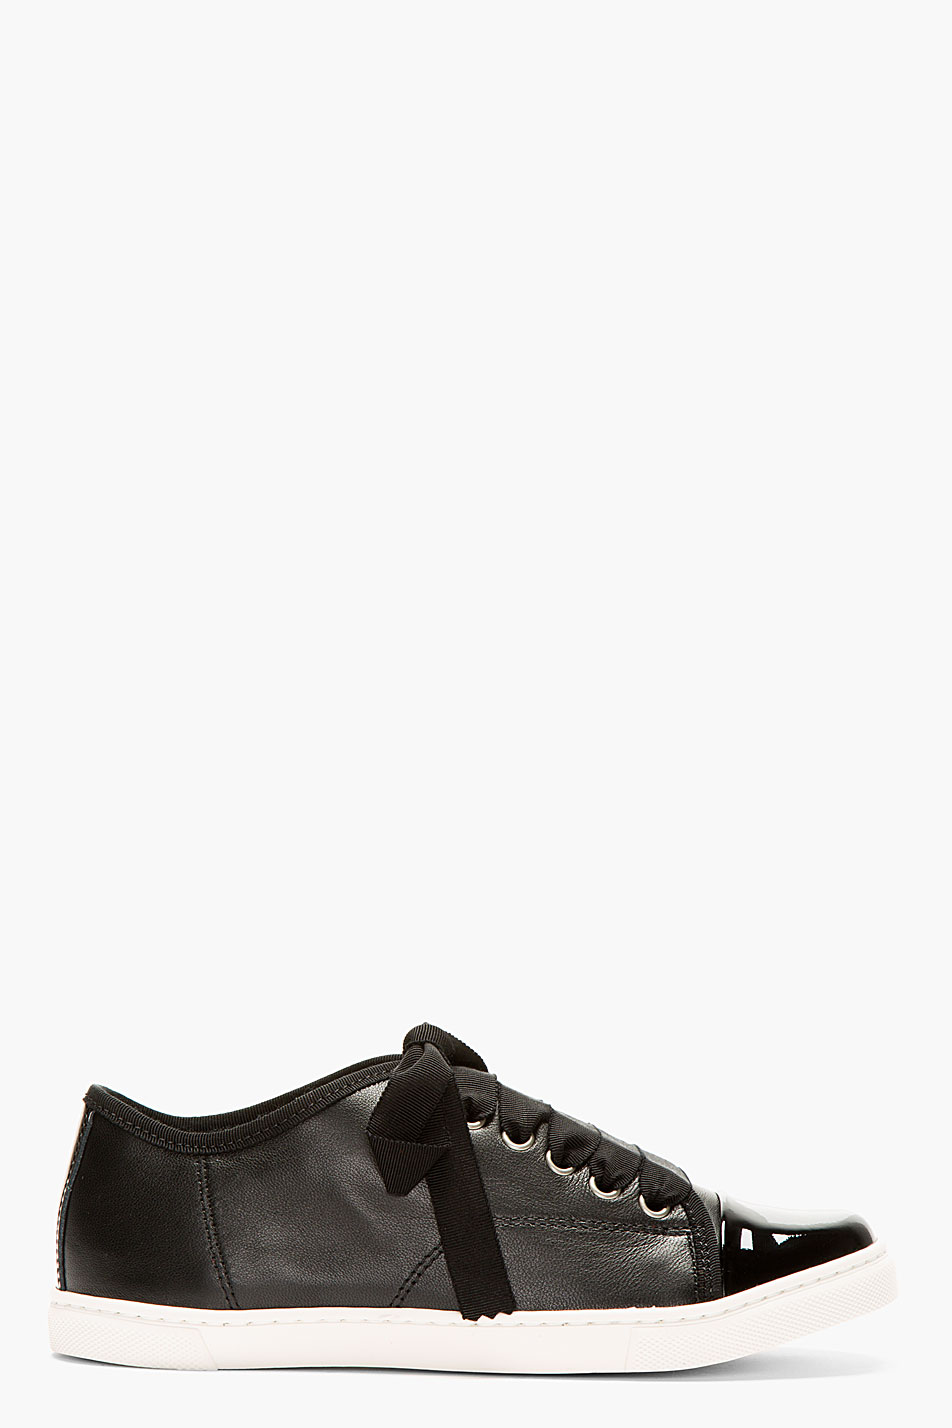 Lanvin black leather ribbon laces sneakers